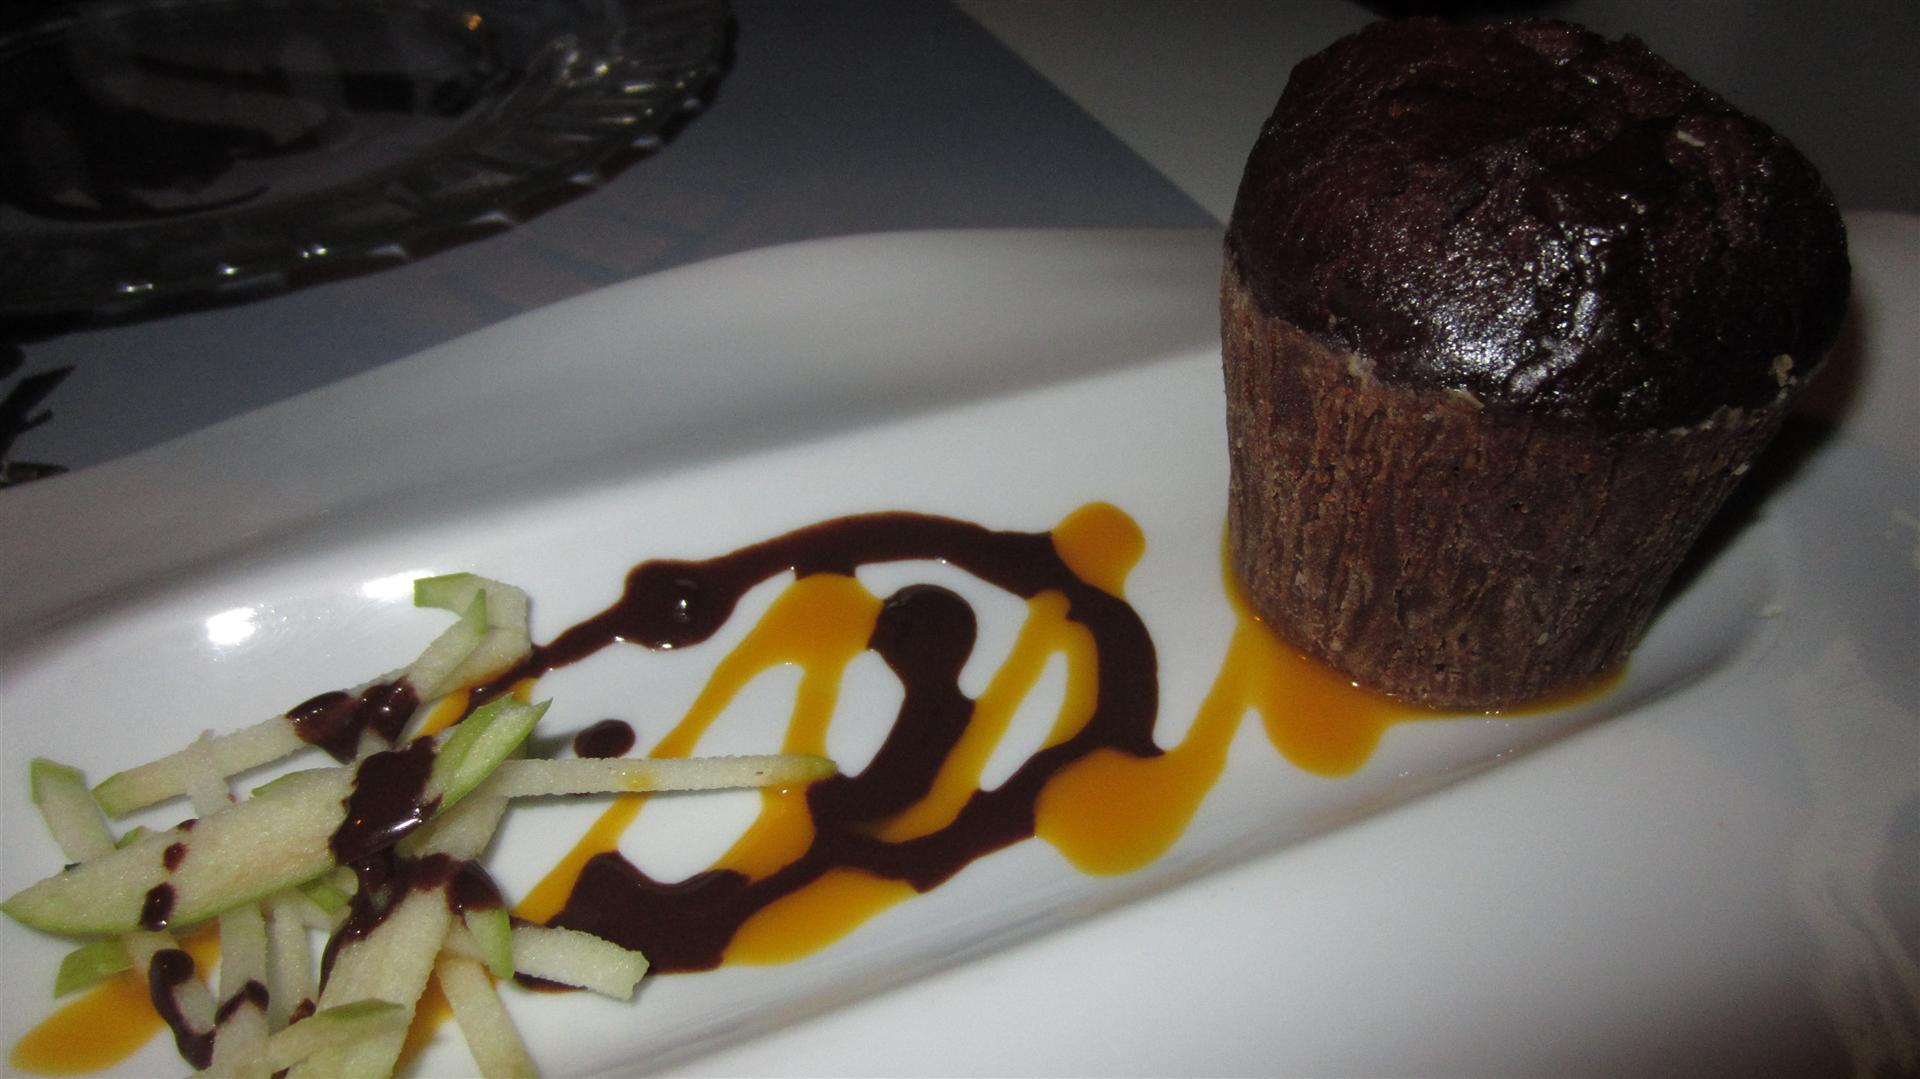 Mercatbar en Valencia Chocolate muffin/fondant/souffle (?)